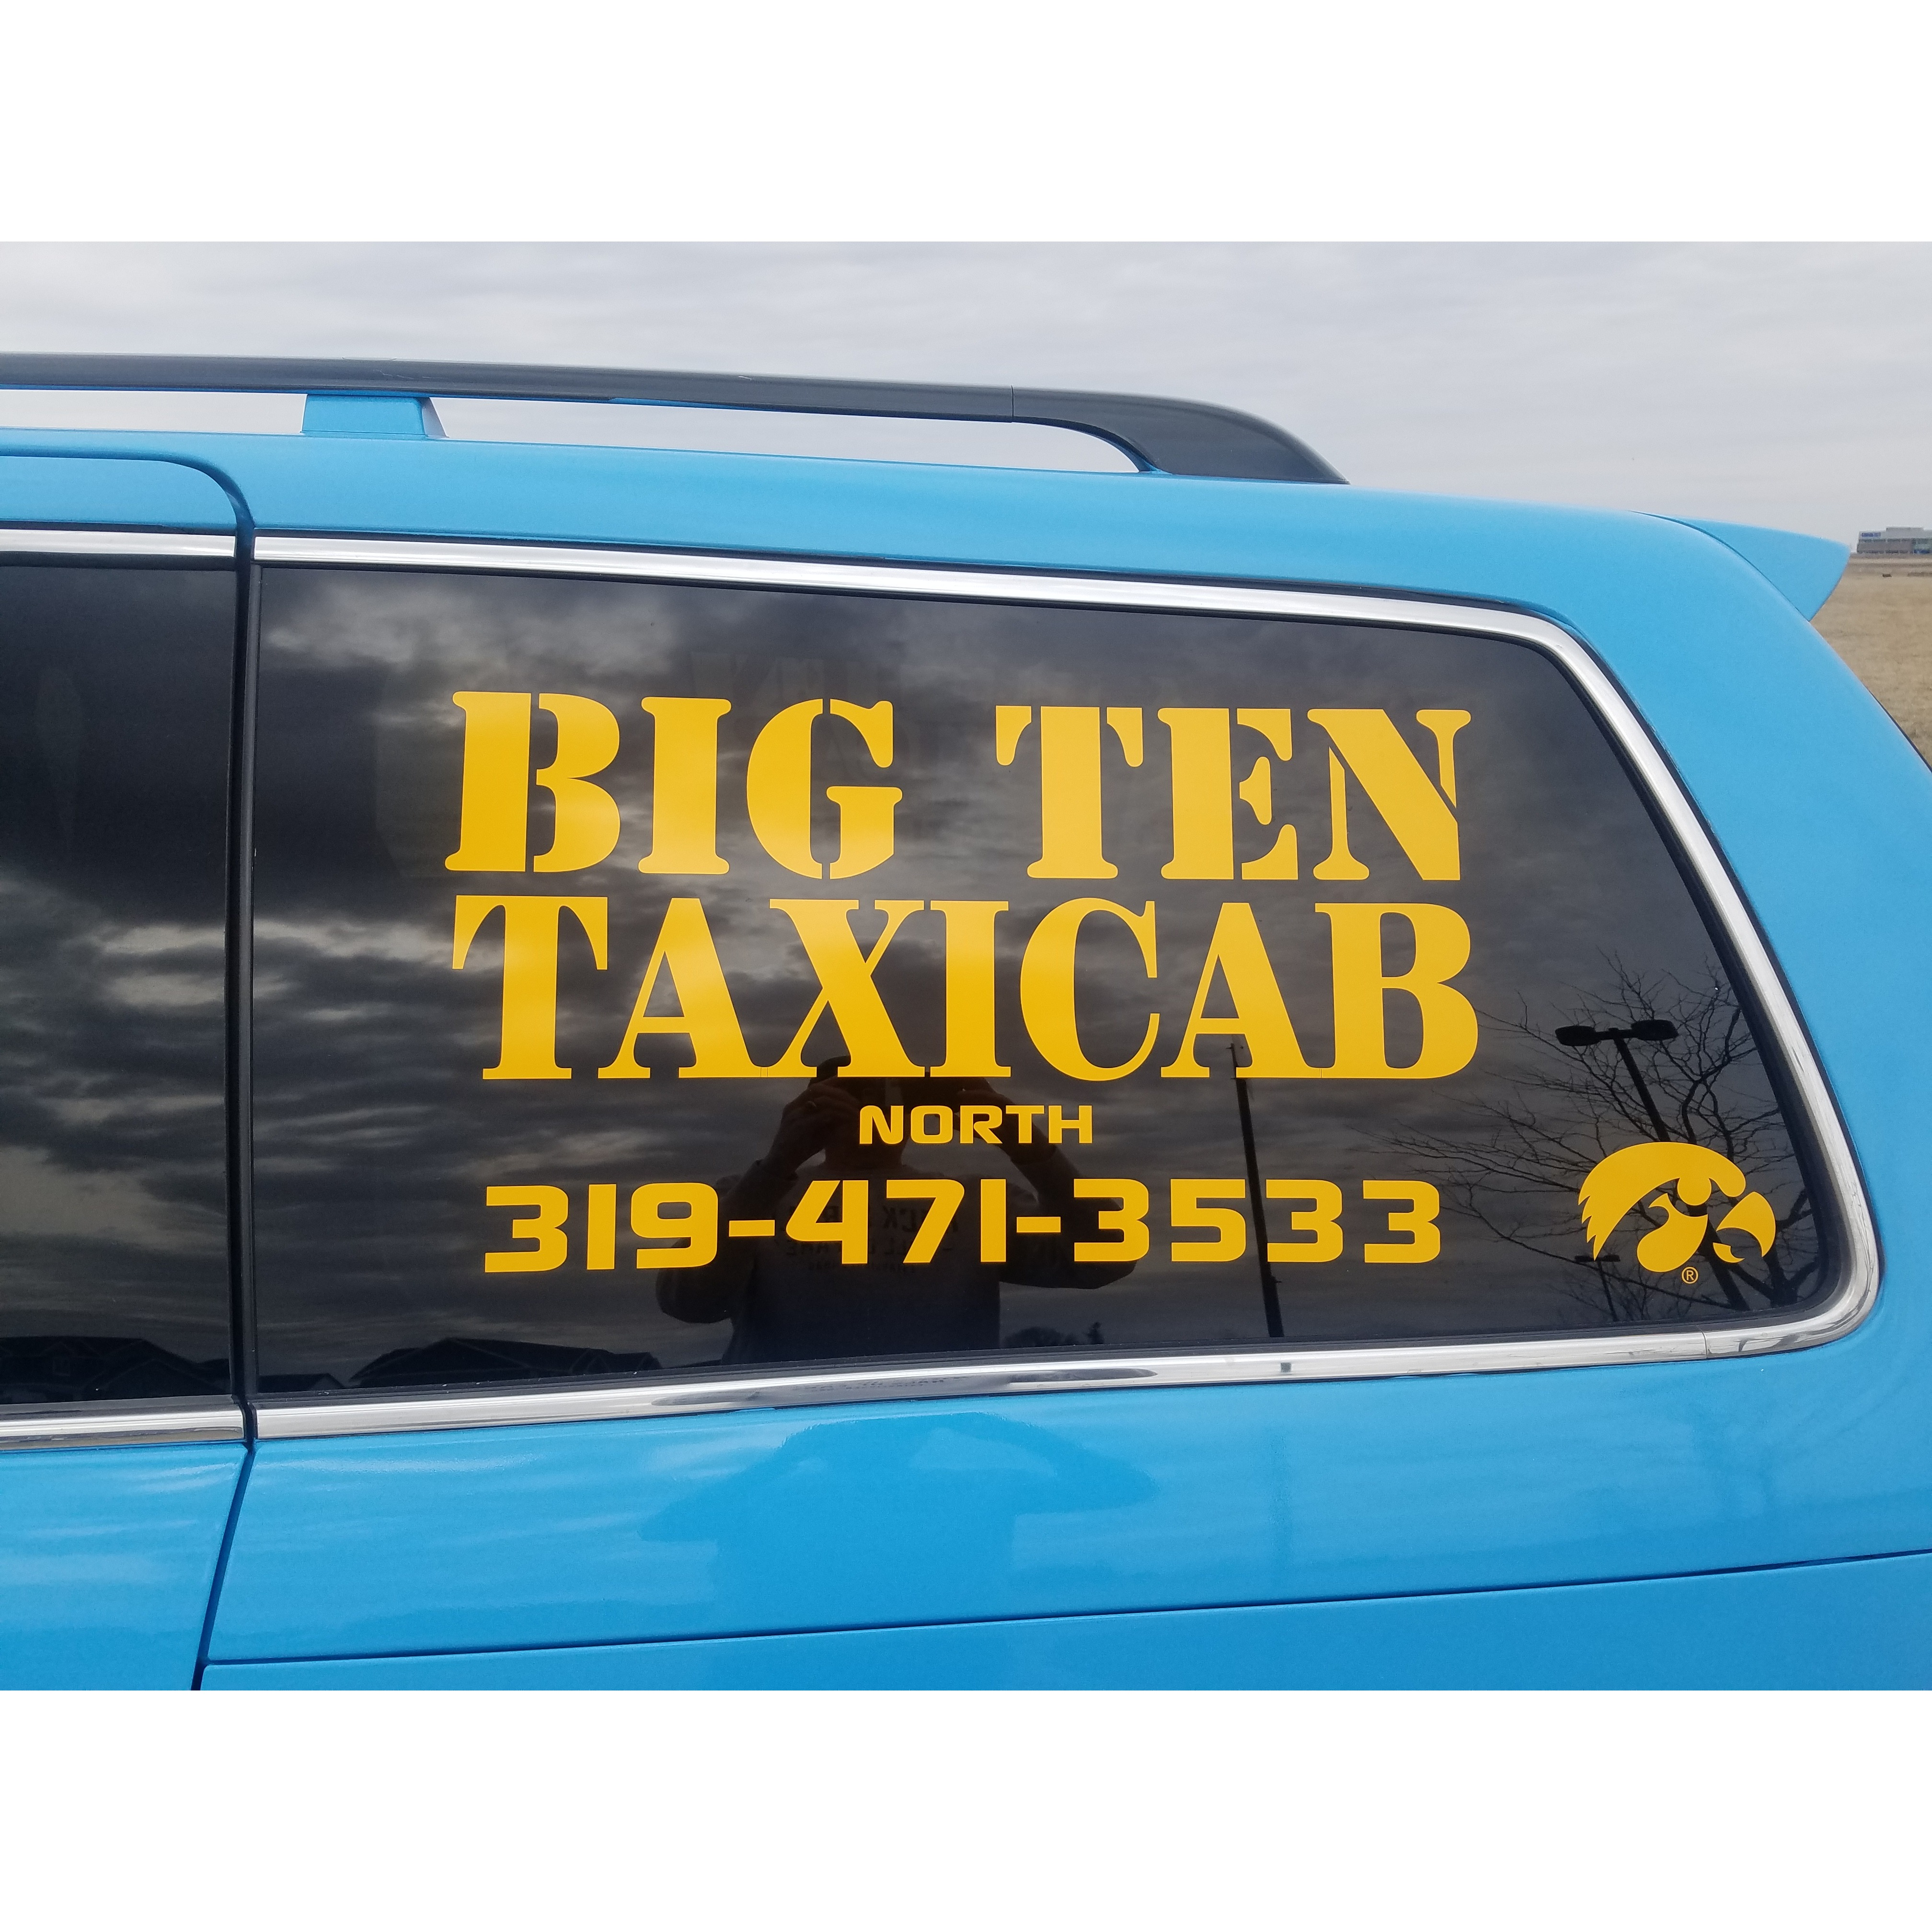 Big Ten Taxicab North